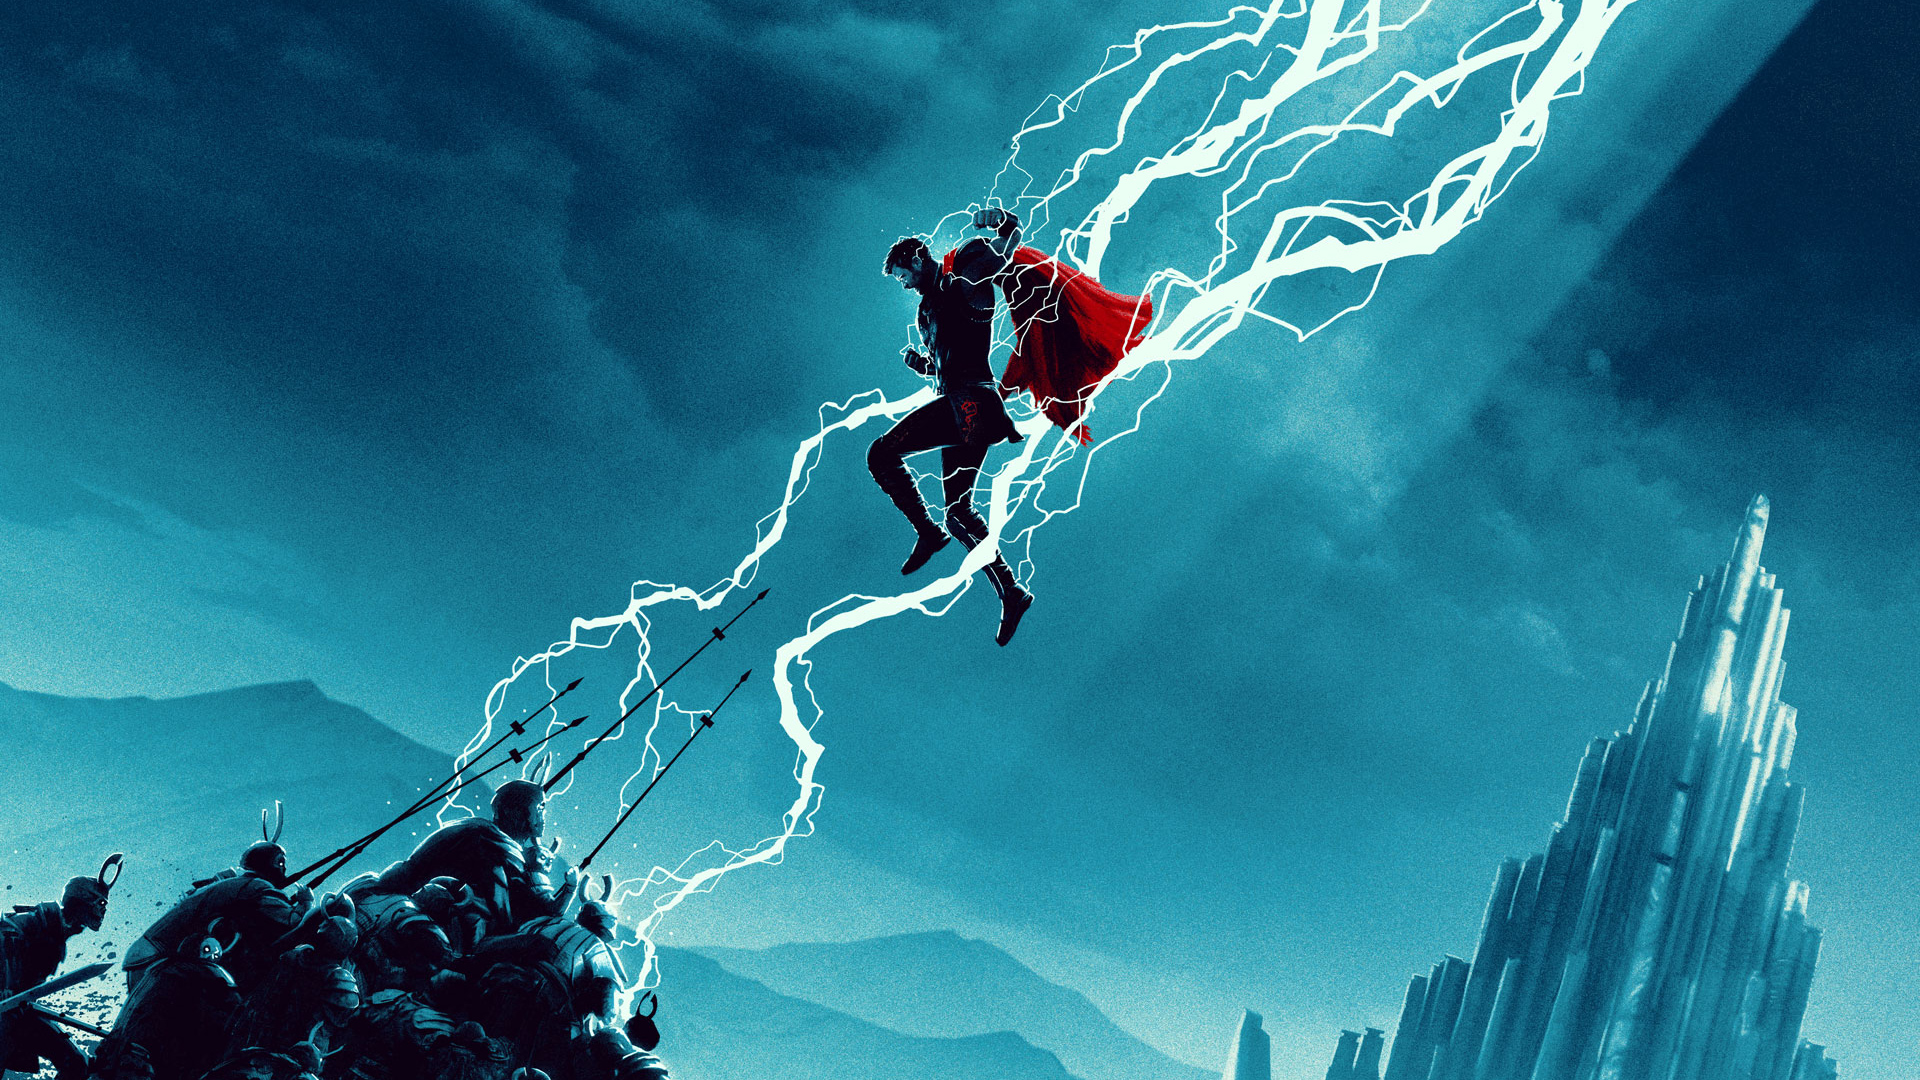 Thor ragnarok movie artwork 2018 hd superheroes 4k - Thor ragnarok hd wallpapers download ...